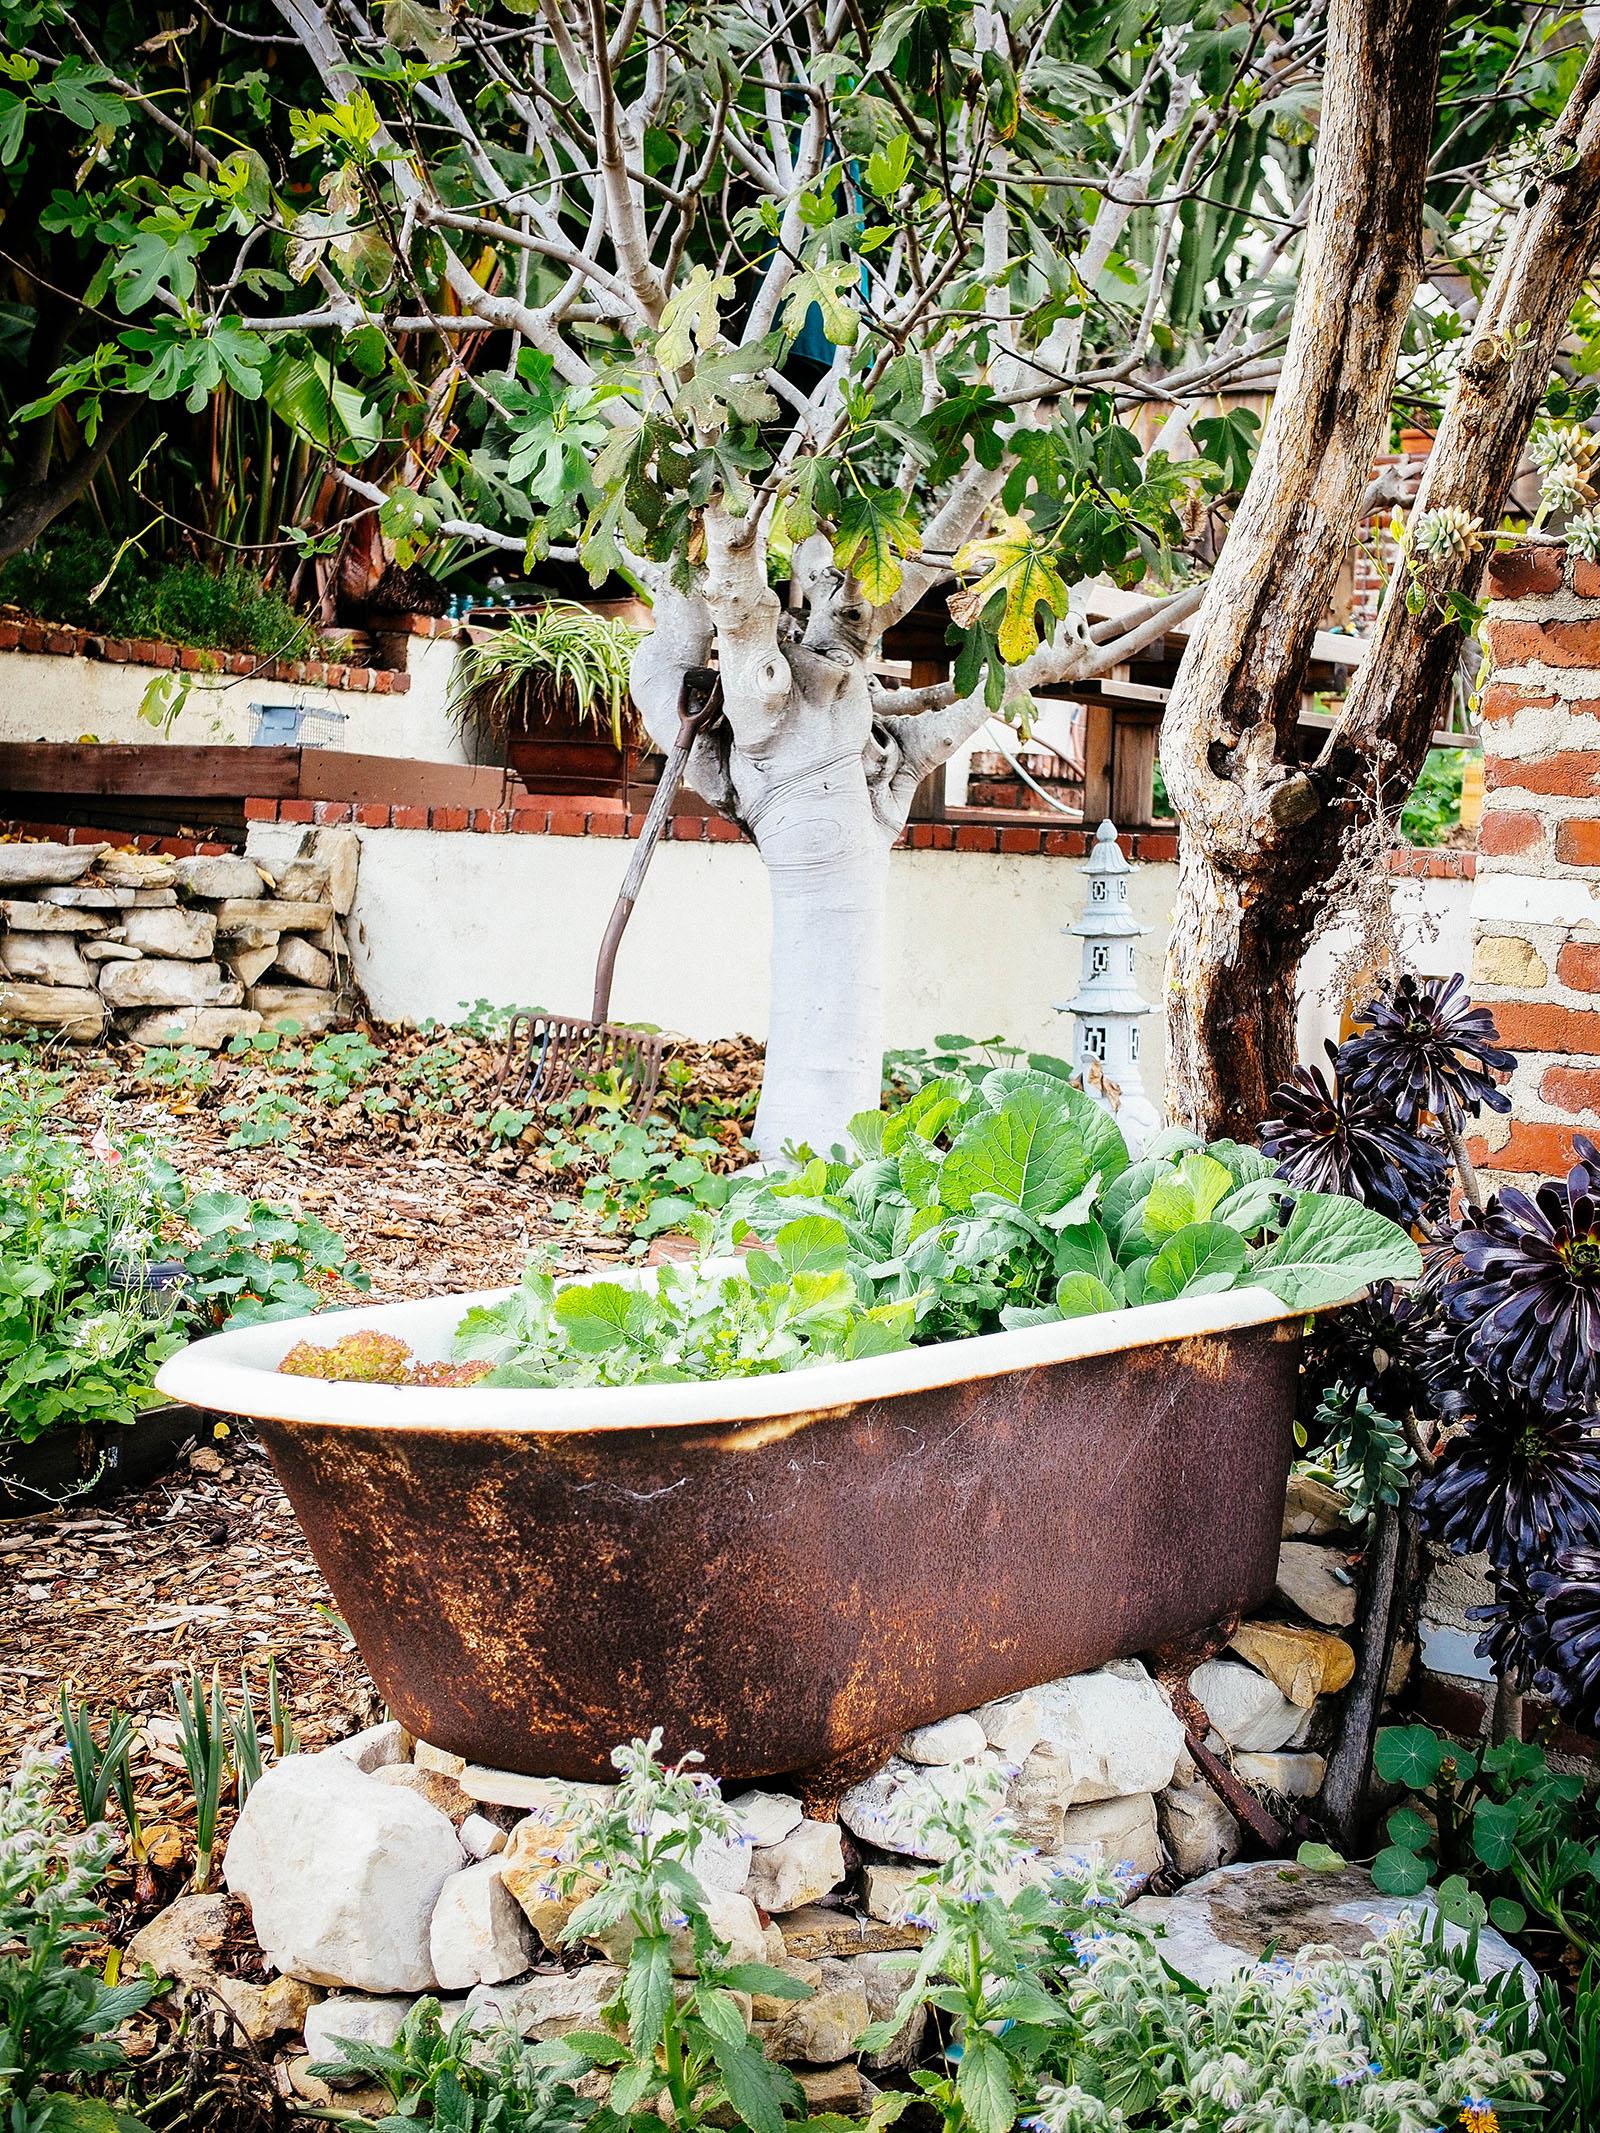 The no-dig vegetable garden